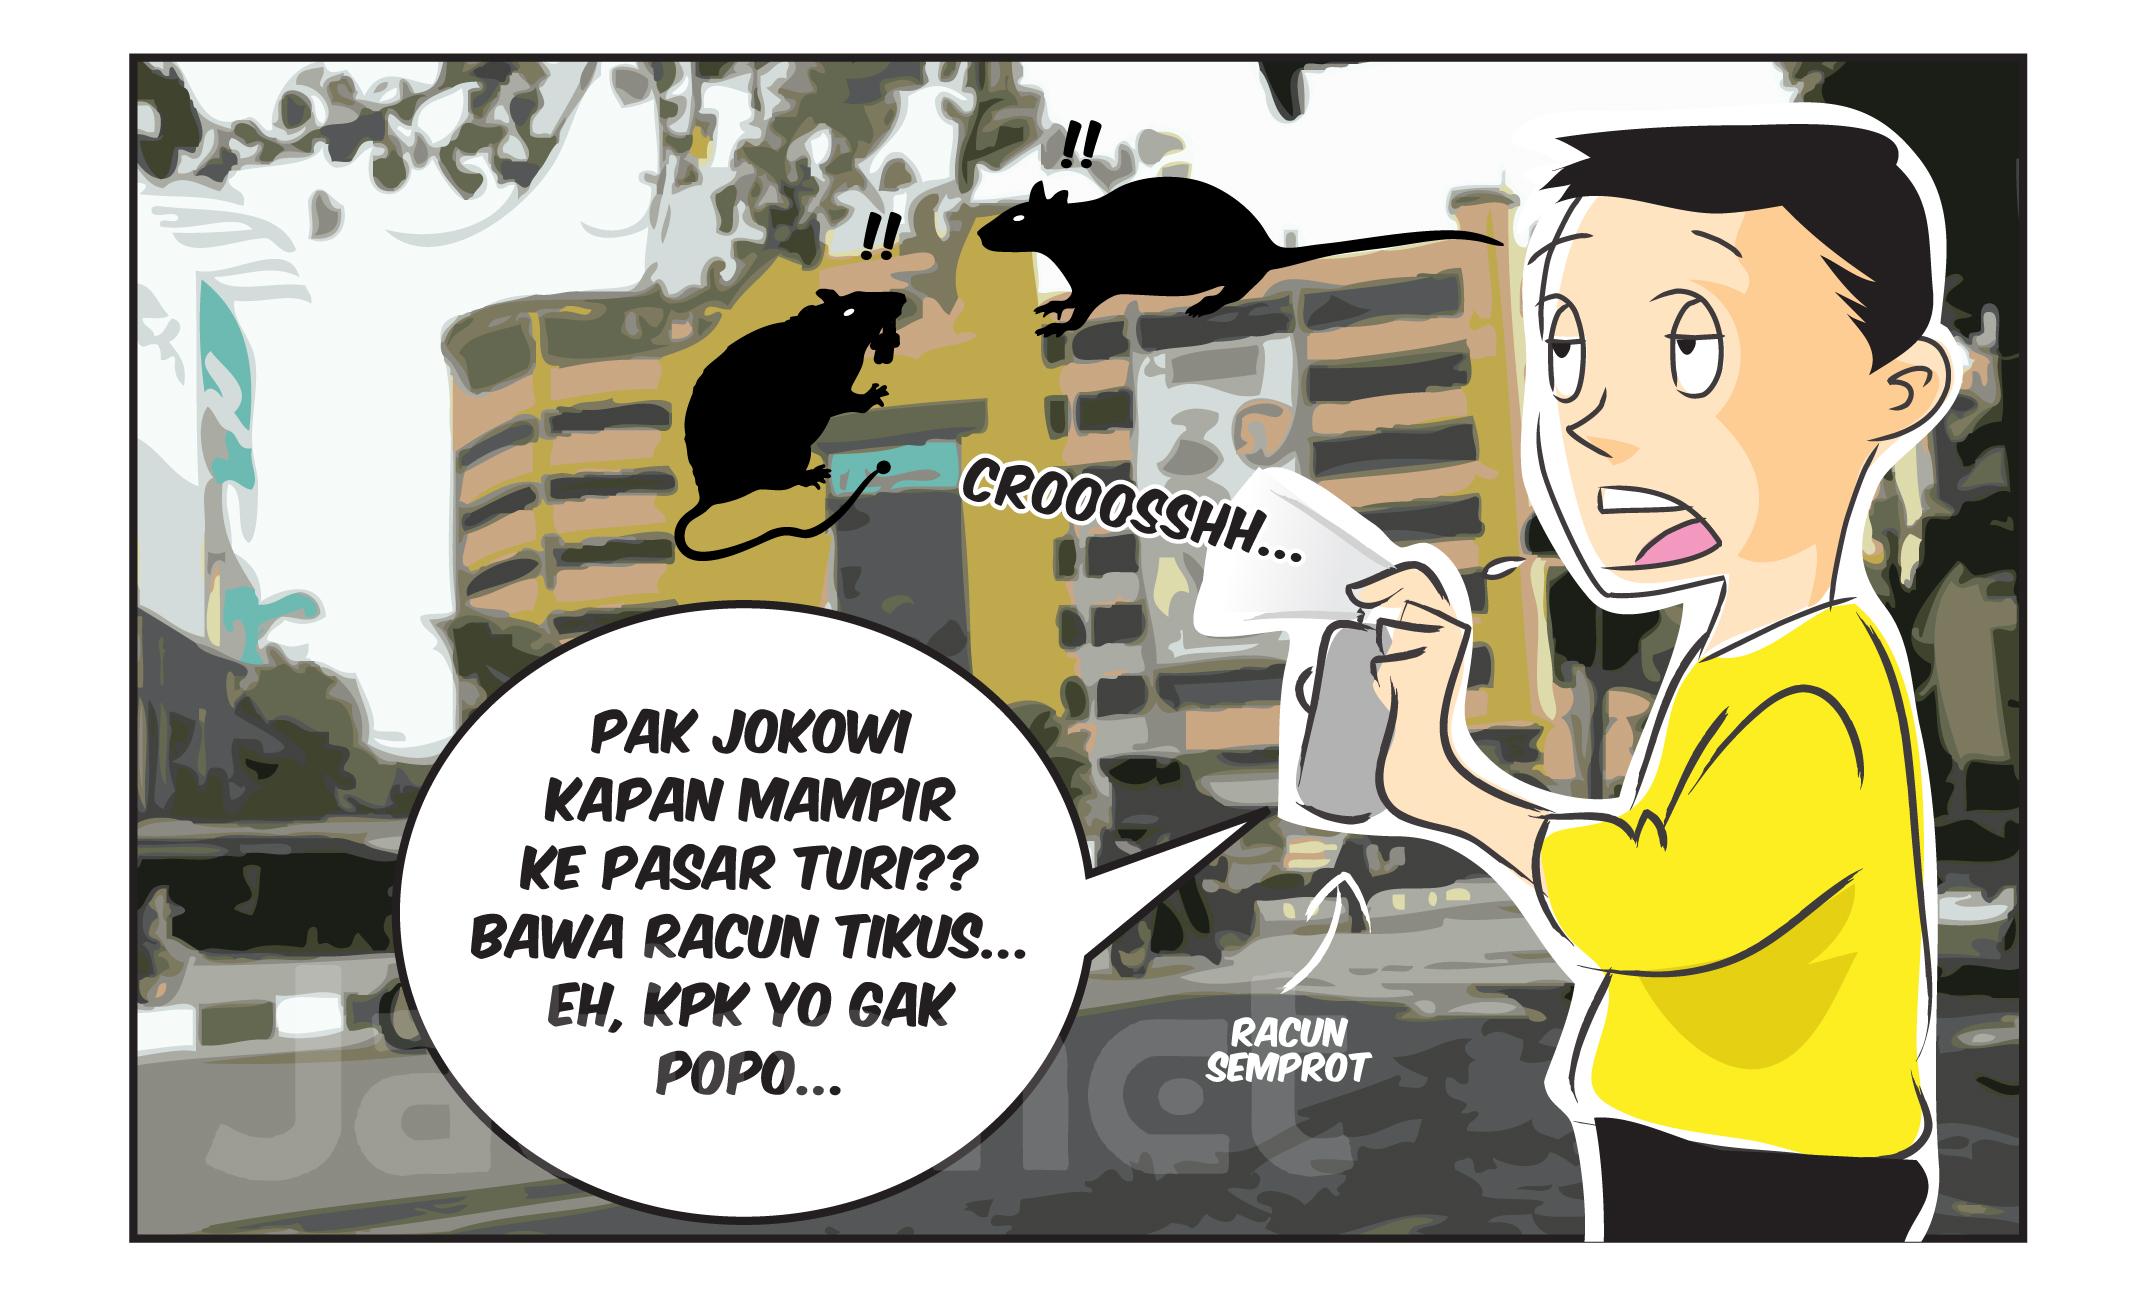 Kapan Jokowi Mampir Pasar Turi